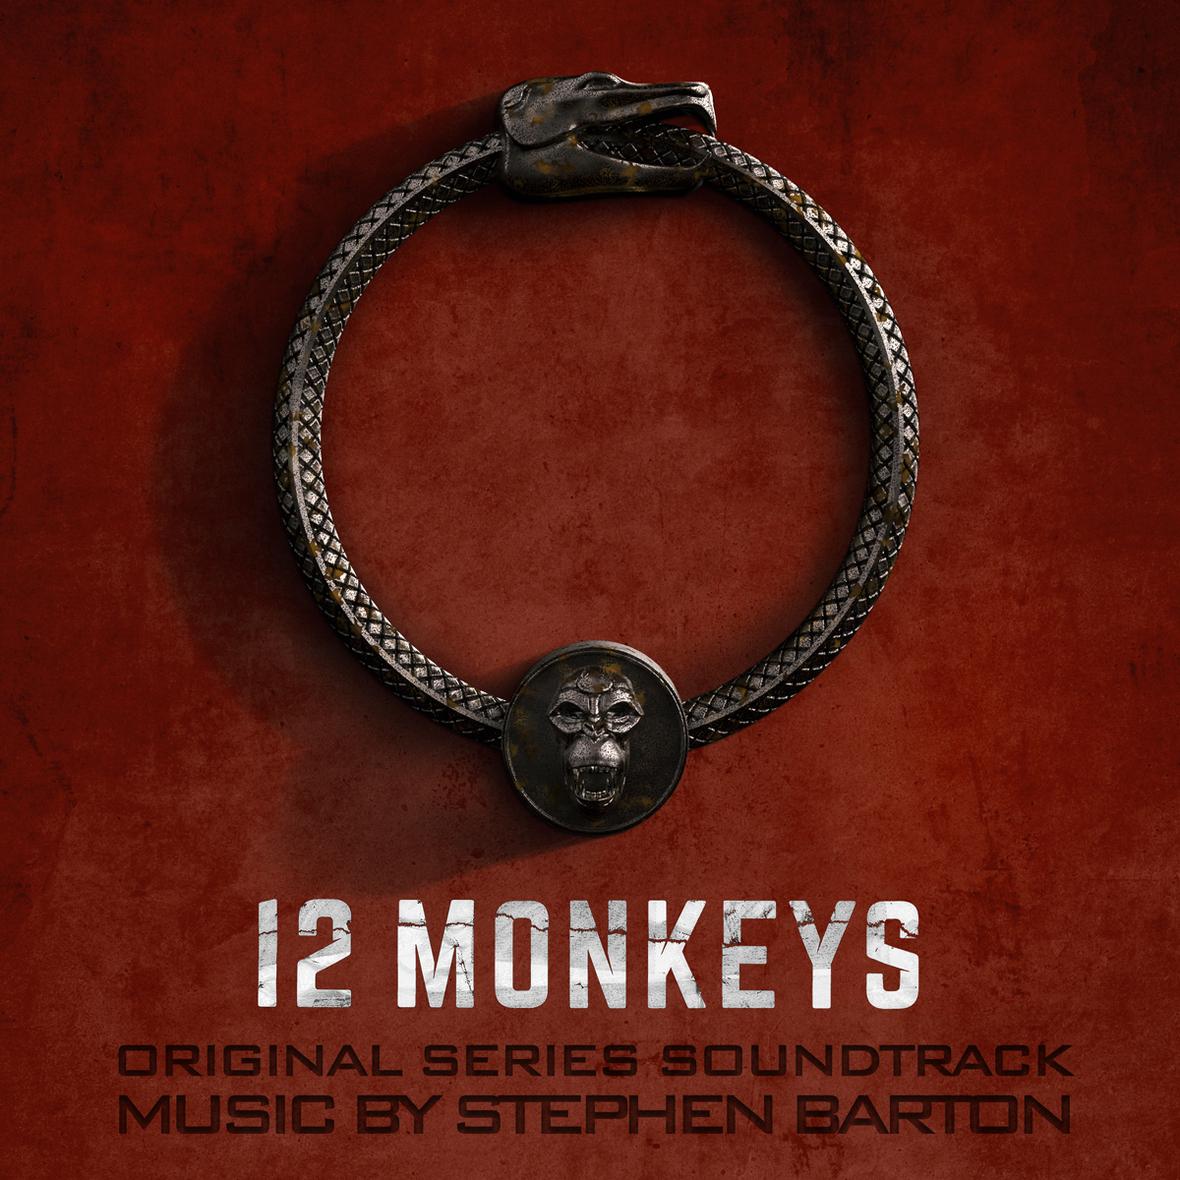 12-monkeys 1200